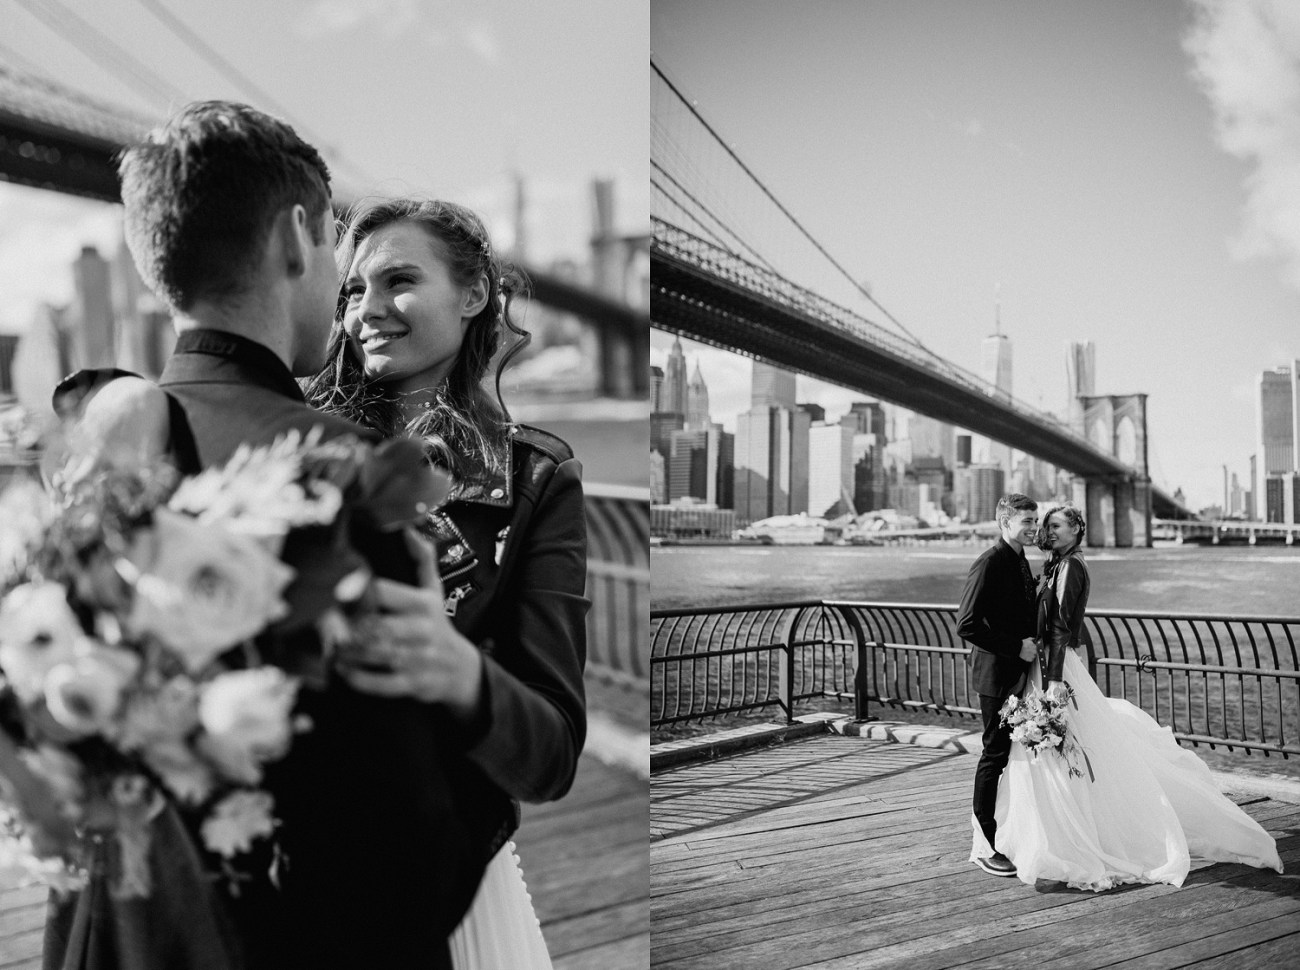 Bride and Groom kissing in front of the Brooklyn Bridge. Dumbo Brooklyn wedding photos. Dumbo Brooklyn Bride and Groom elopement photos. Anais Possamai Photography. New York Wedding Photographer. NYC elopement Photographer